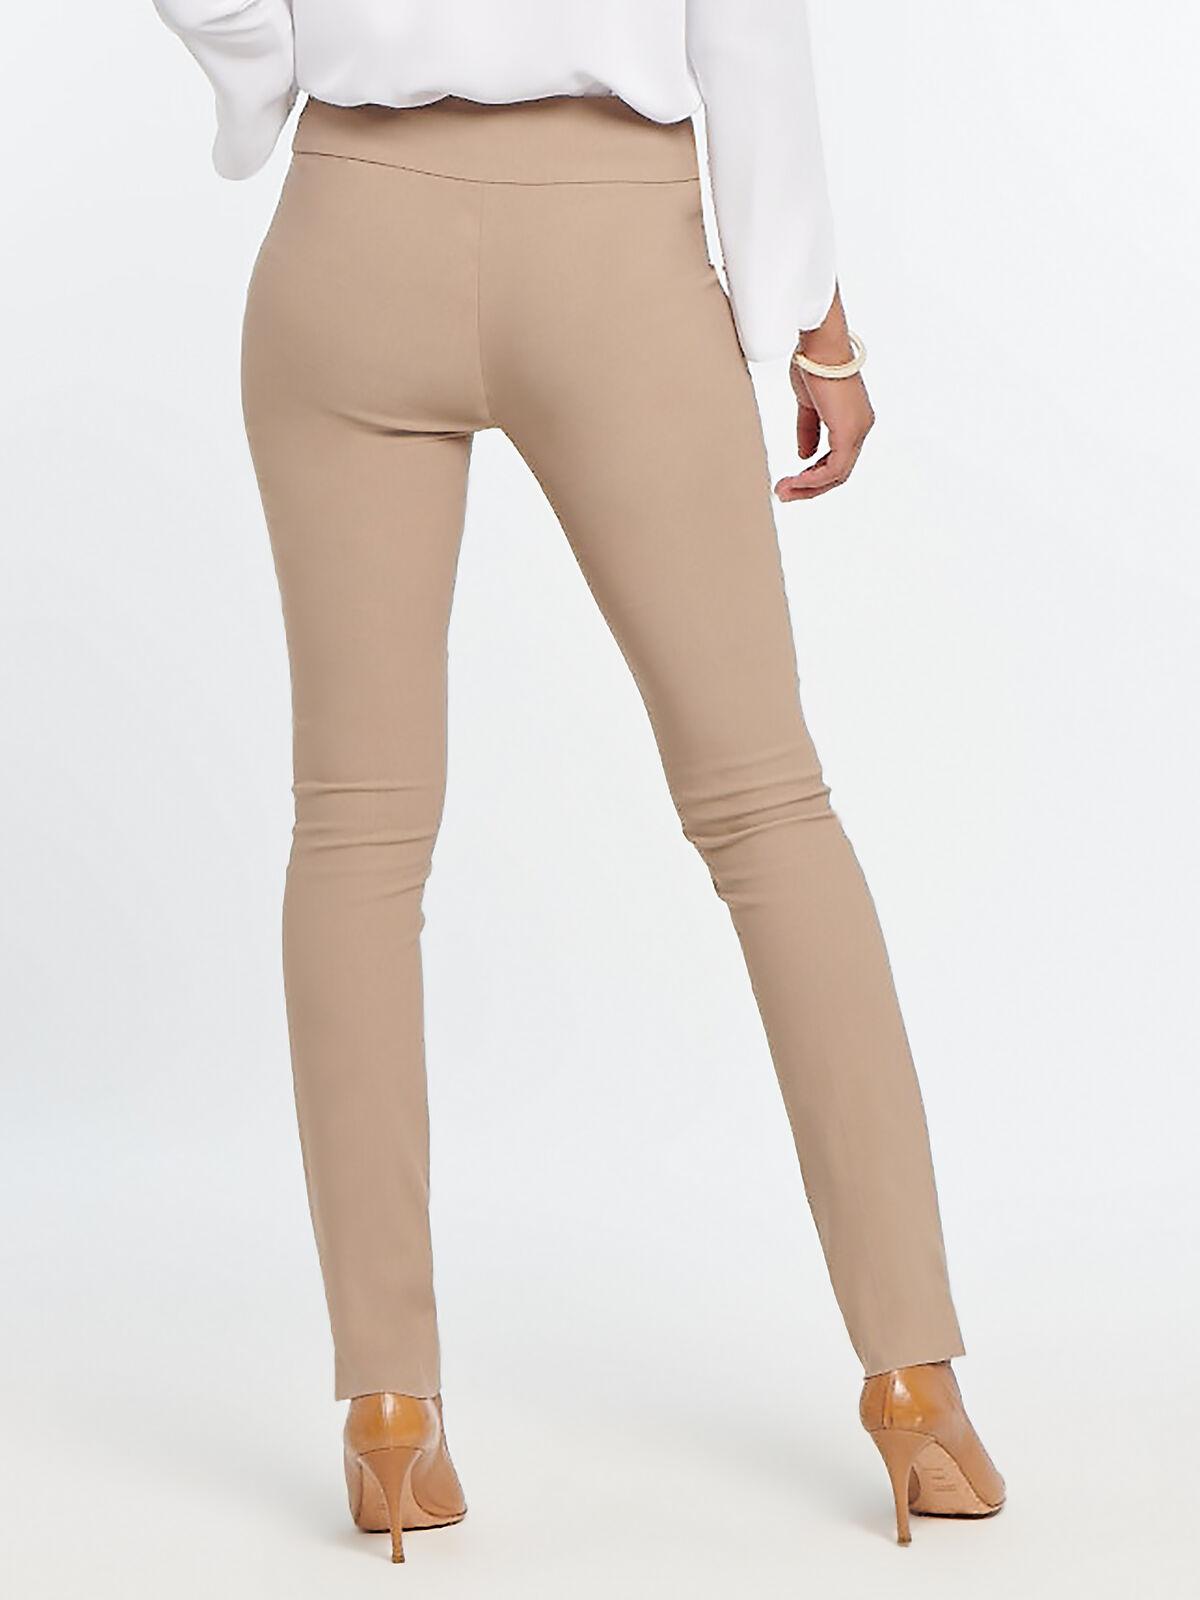 Slim Wonderstretch Pant